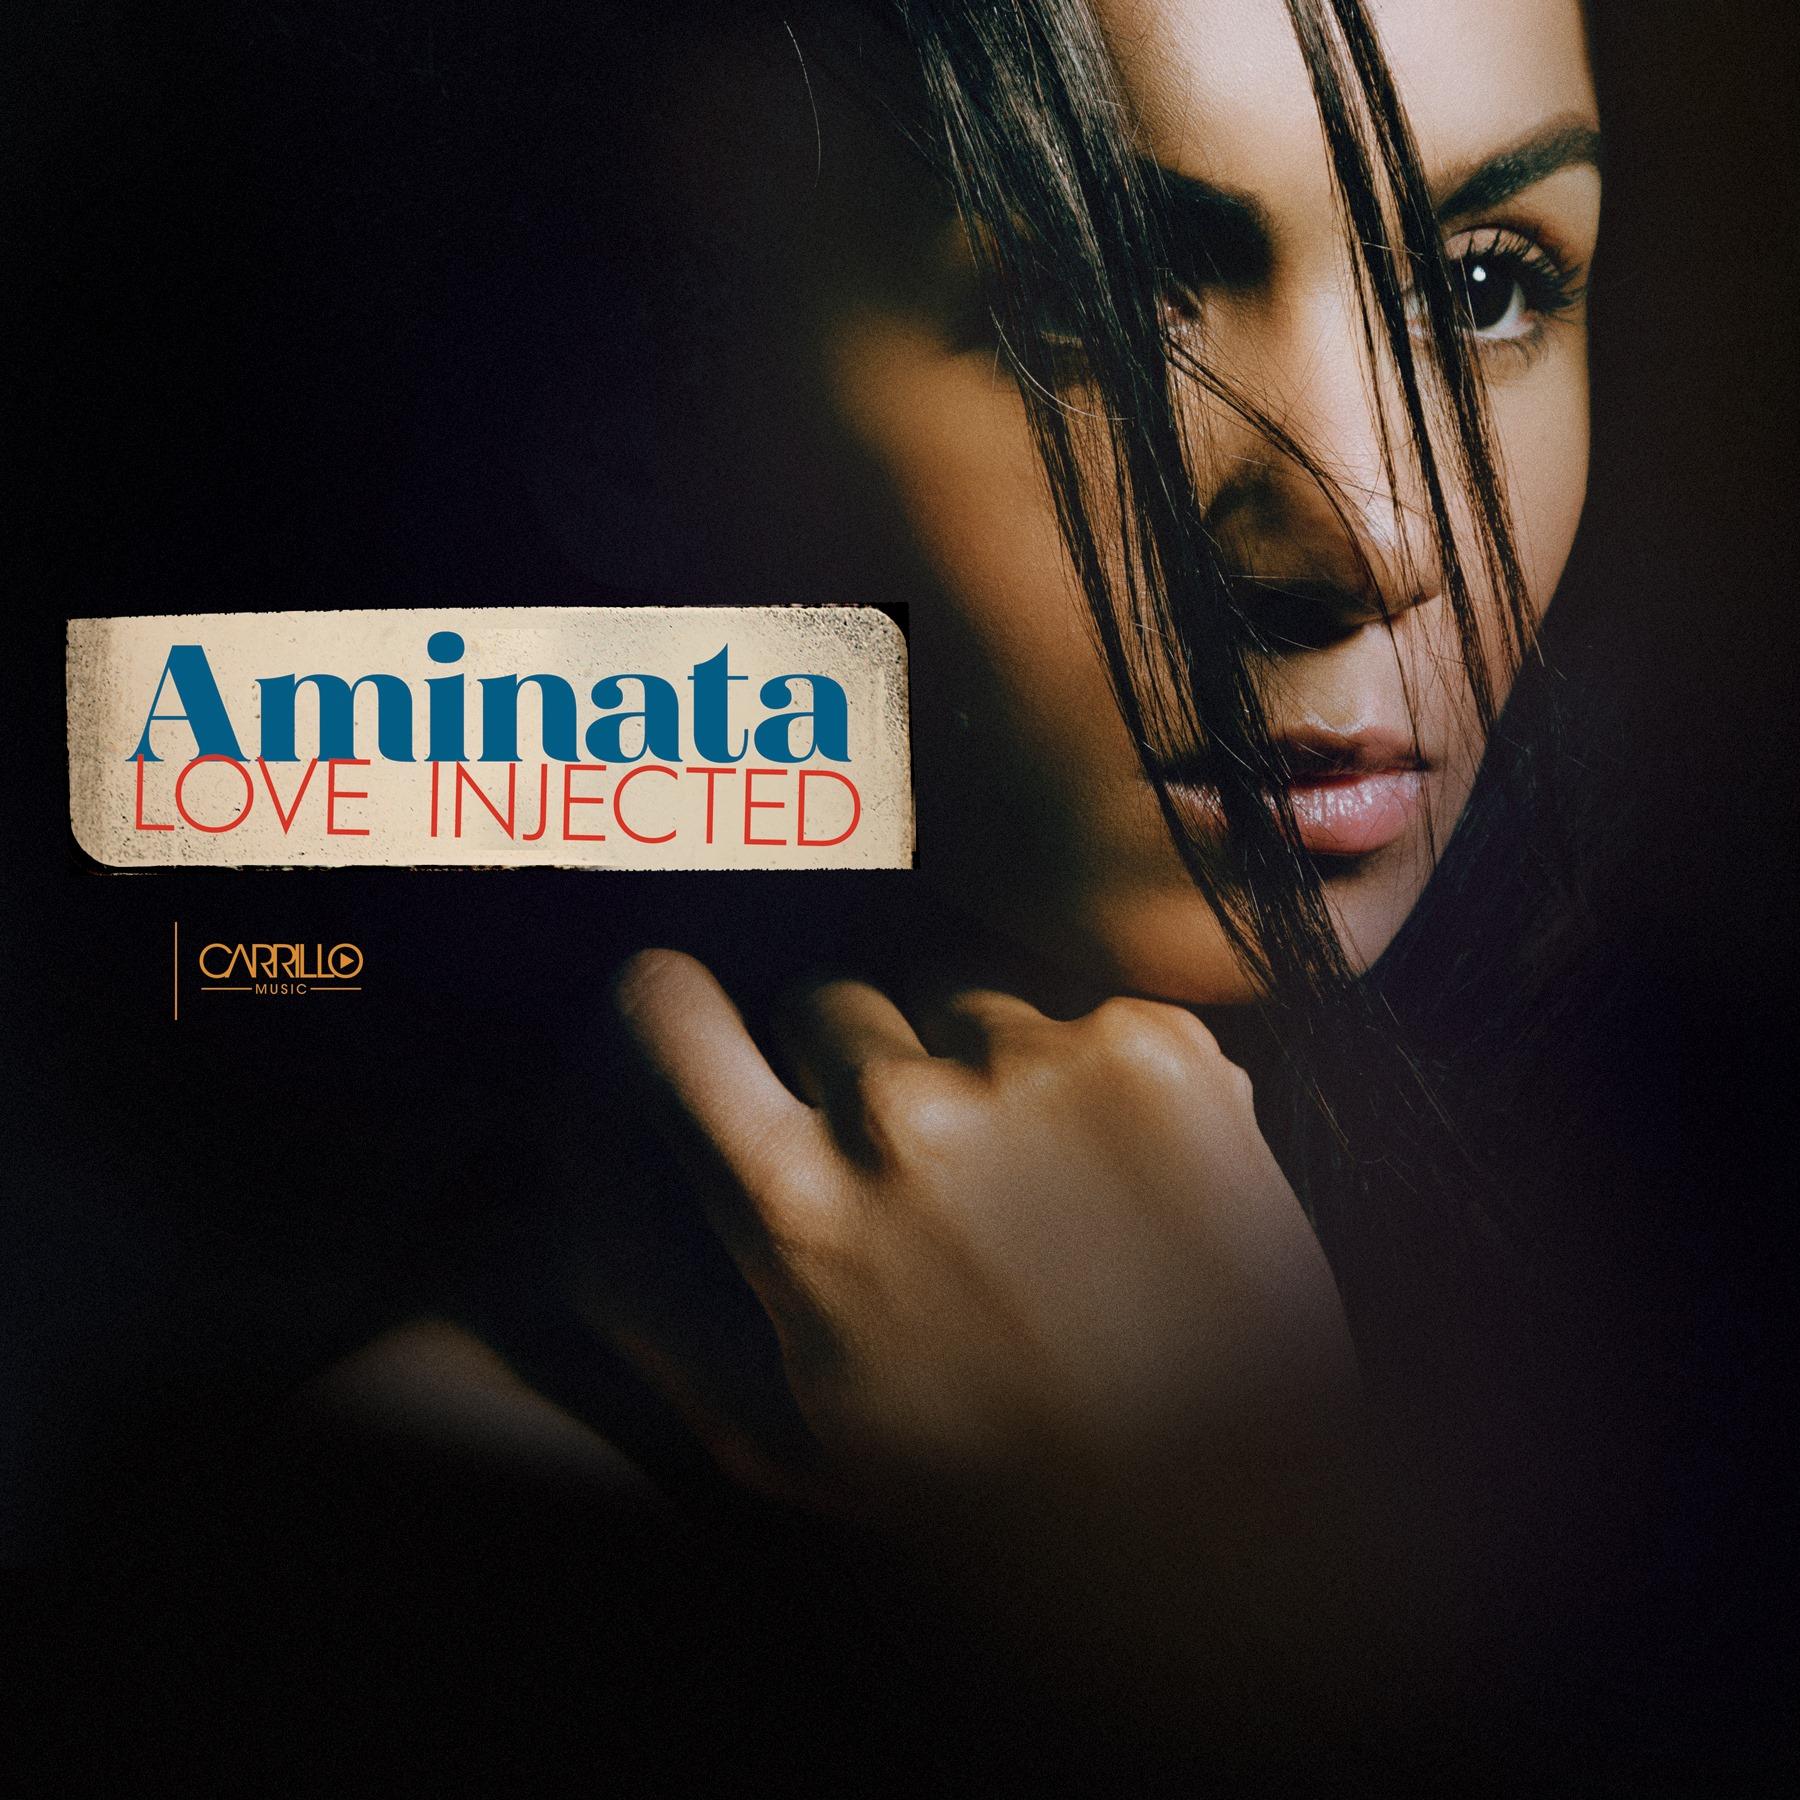 Aminata, Love Injected